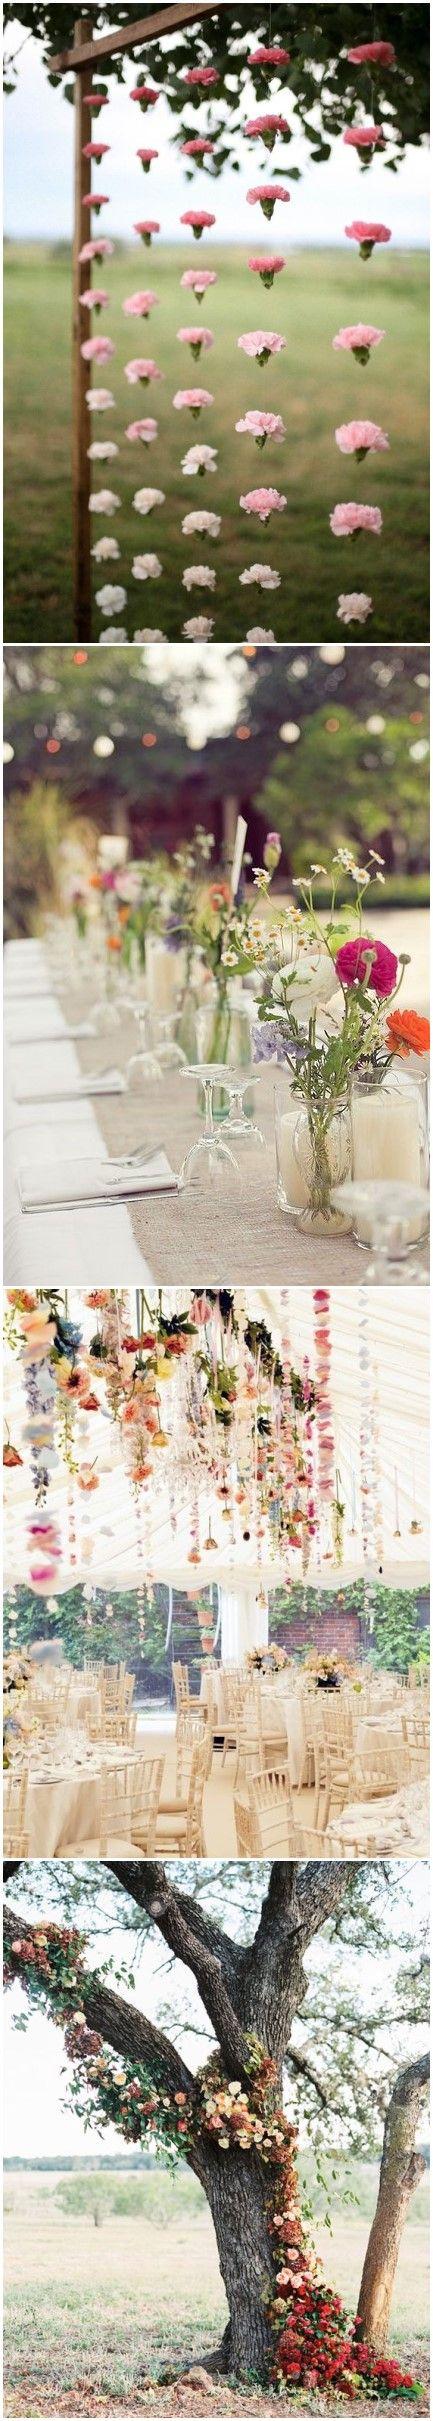 COLORED GLASS  Wedding Ideas » 20+ Gorgeous Boho Wedding Décor Ideas on Pinterest »   ❤️ See more:  http://www.weddinginclude.com/2017/05/boho-wedding-decor-ideas-on-pinterest/